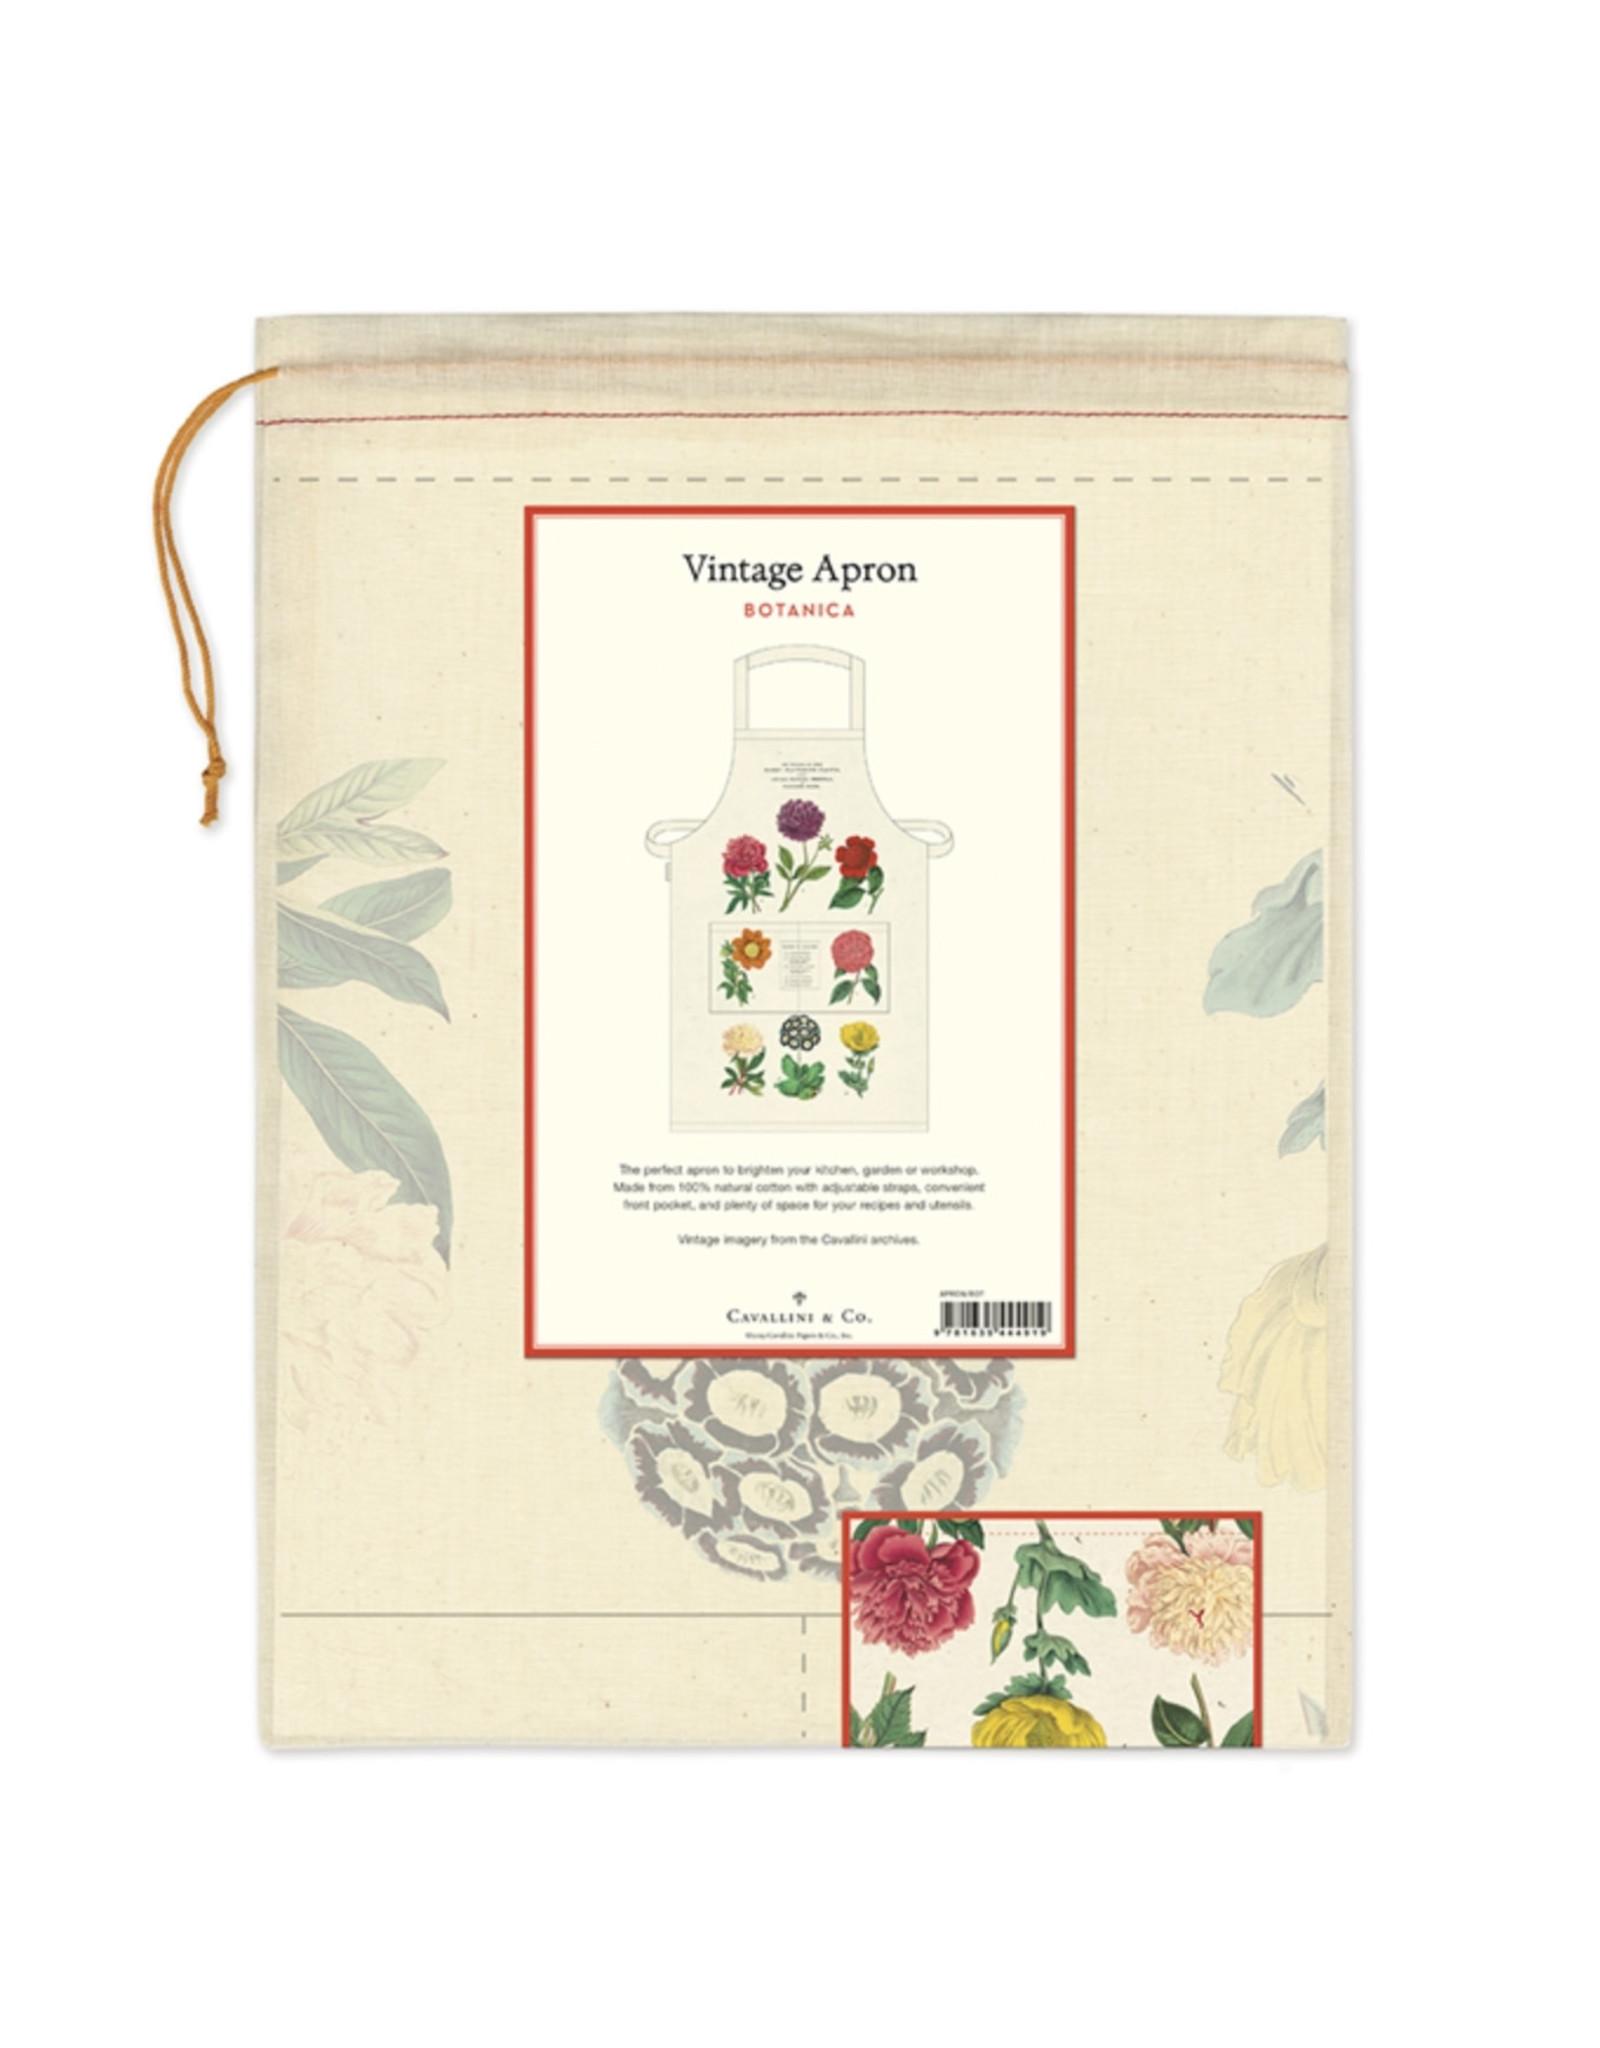 Cavallini Papers & Co. Botanica Vintage Apron